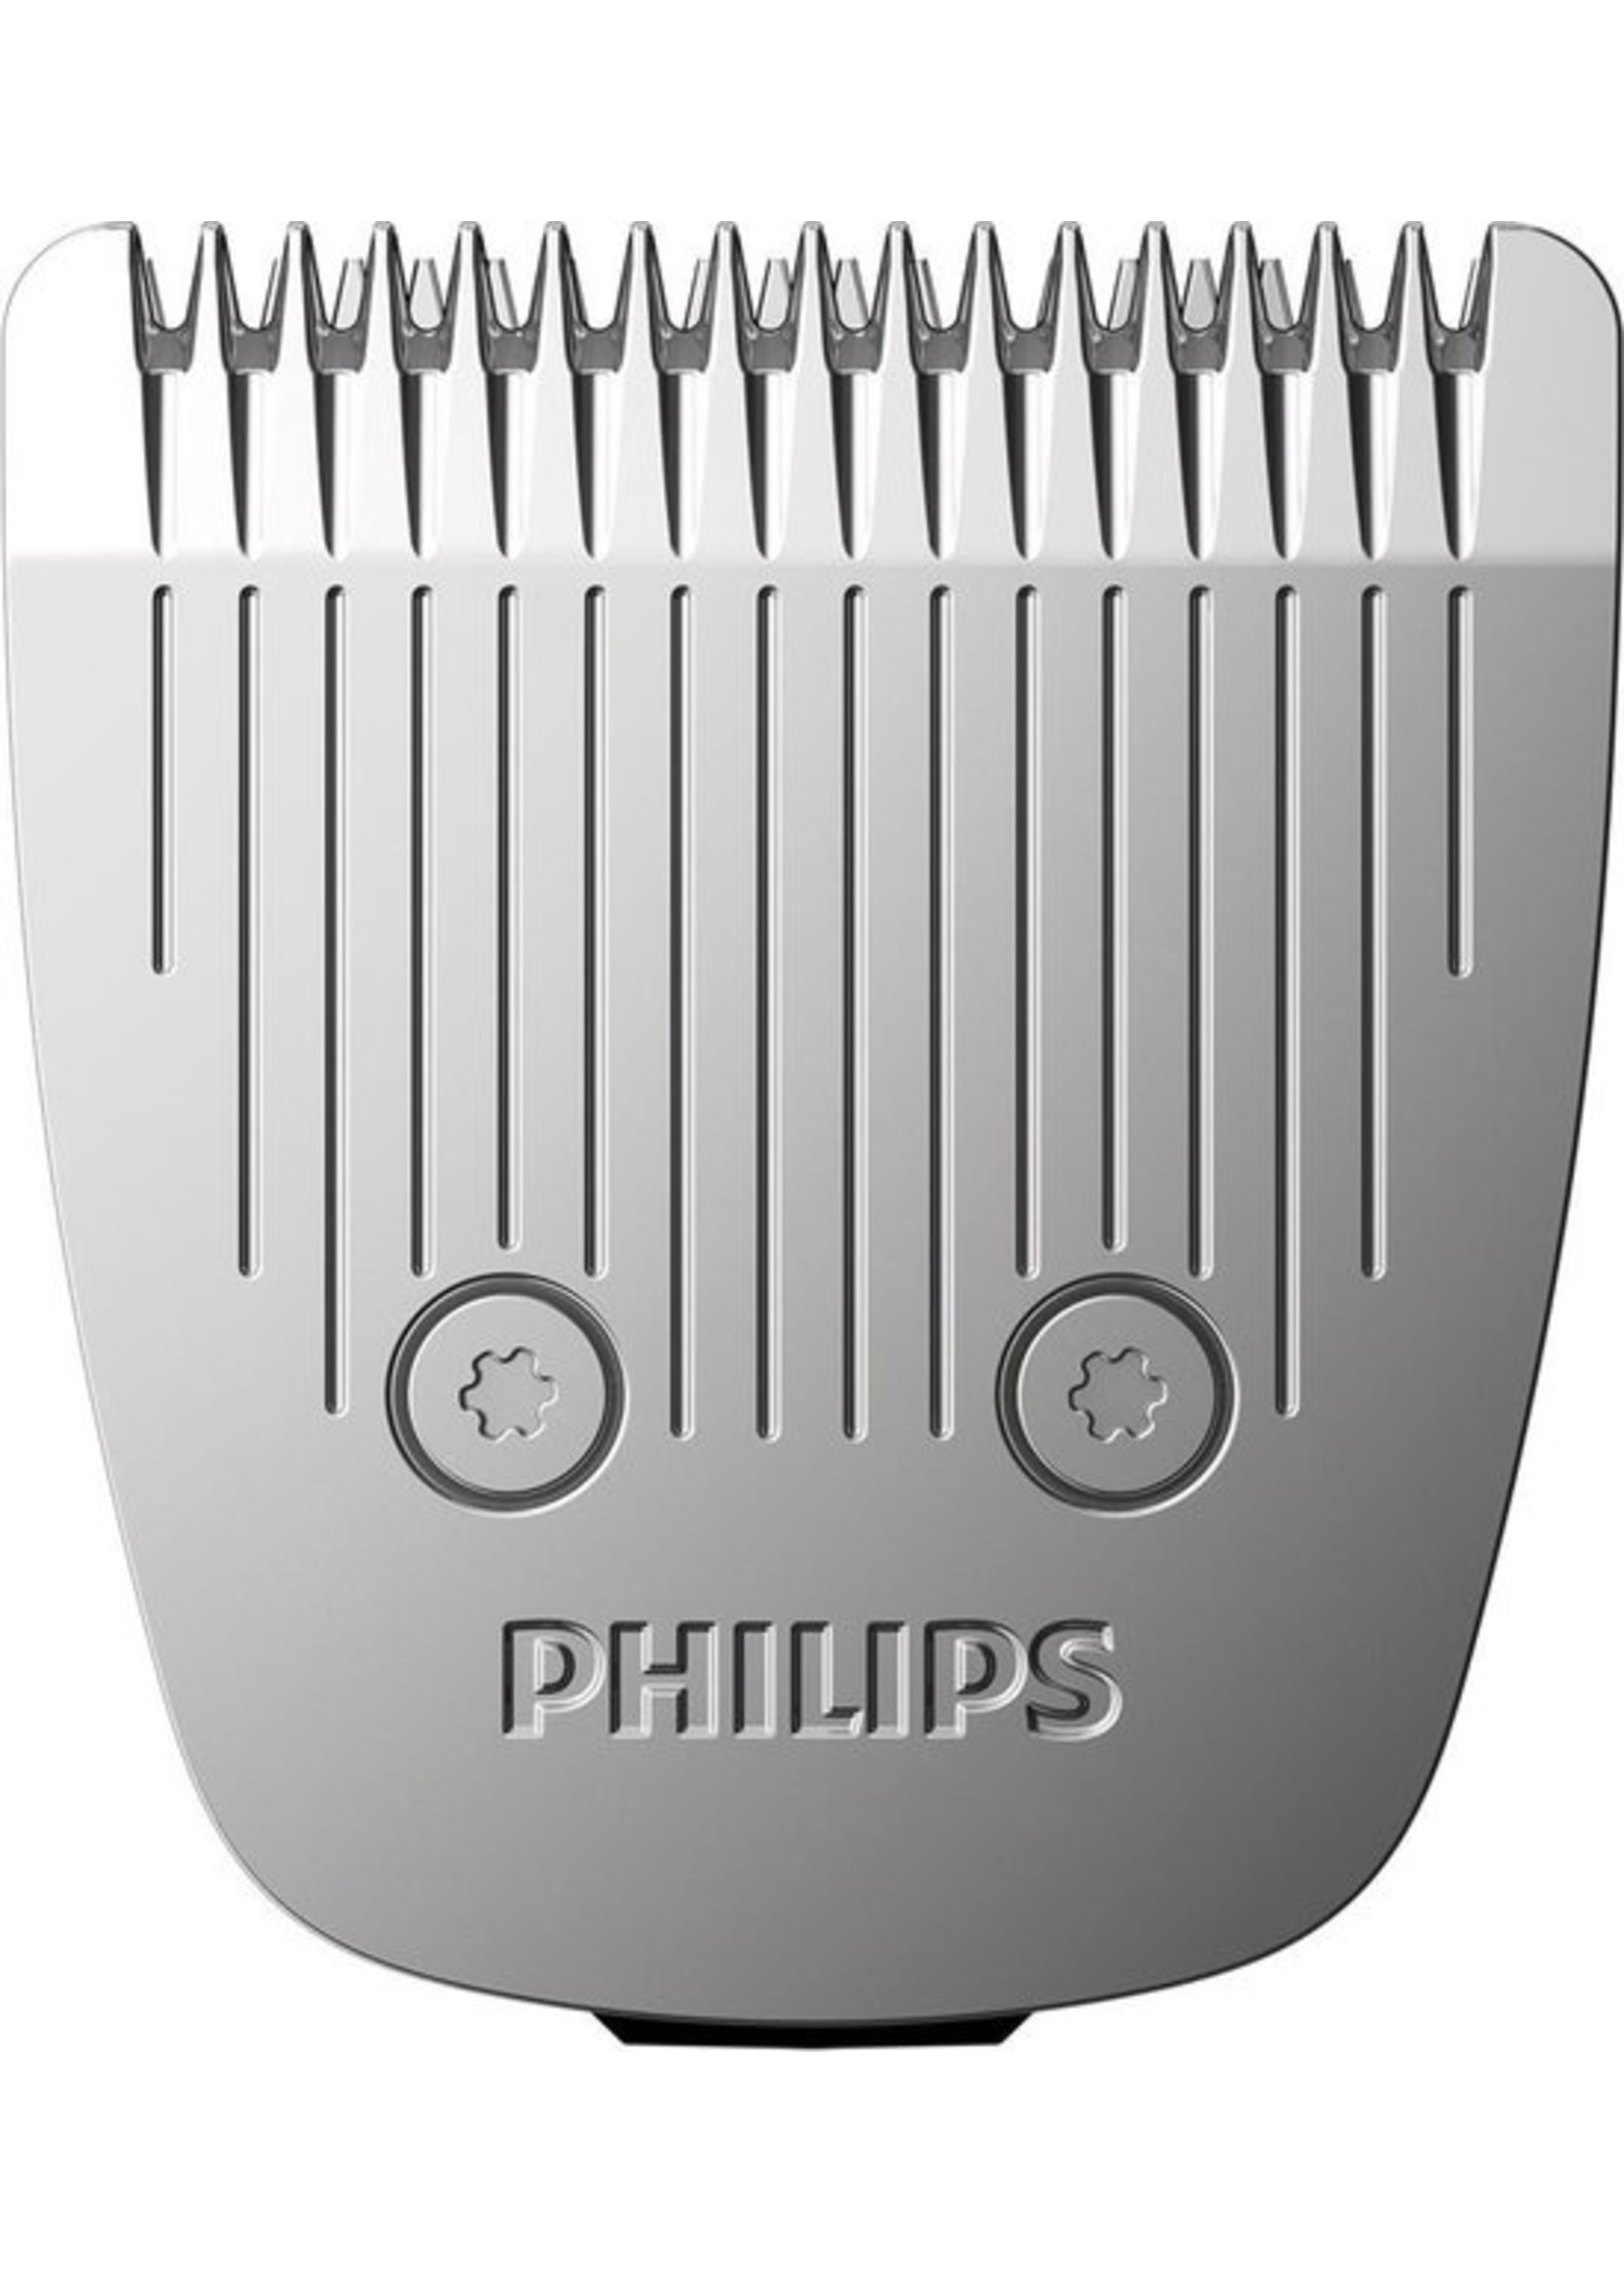 Philips Philips Series 5000 BT5502/15 - Baardtrimmer